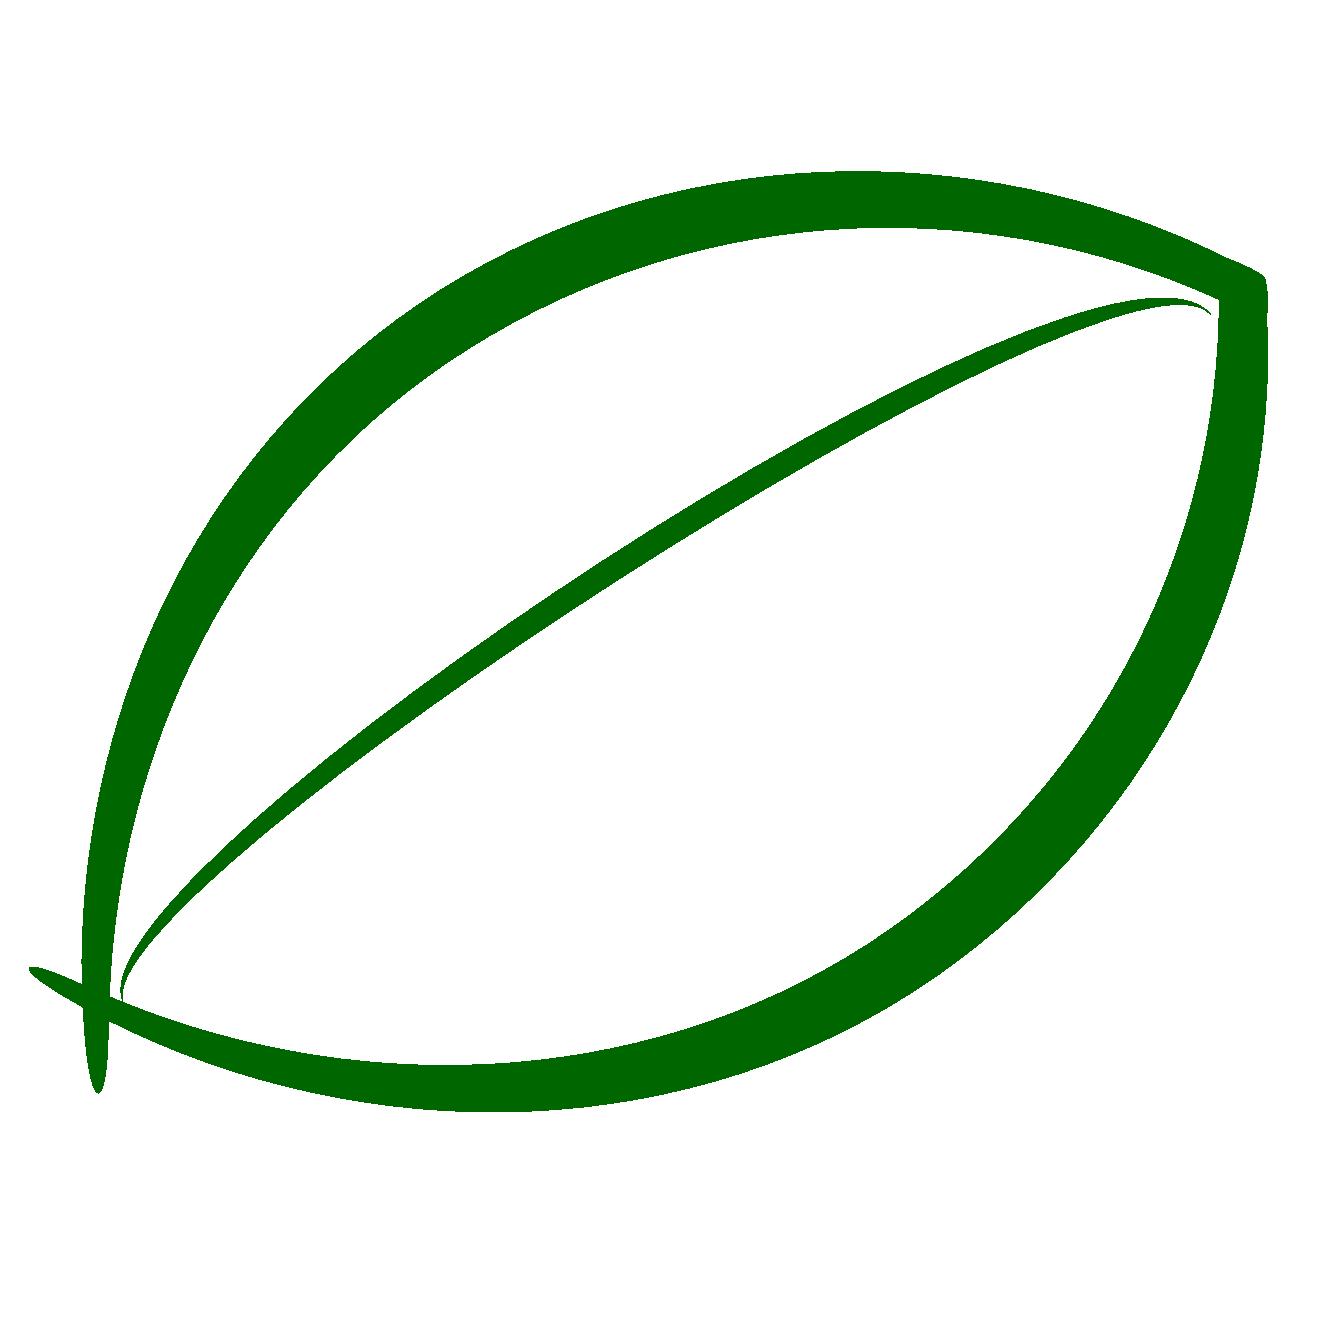 Leaf outline clipart clipart